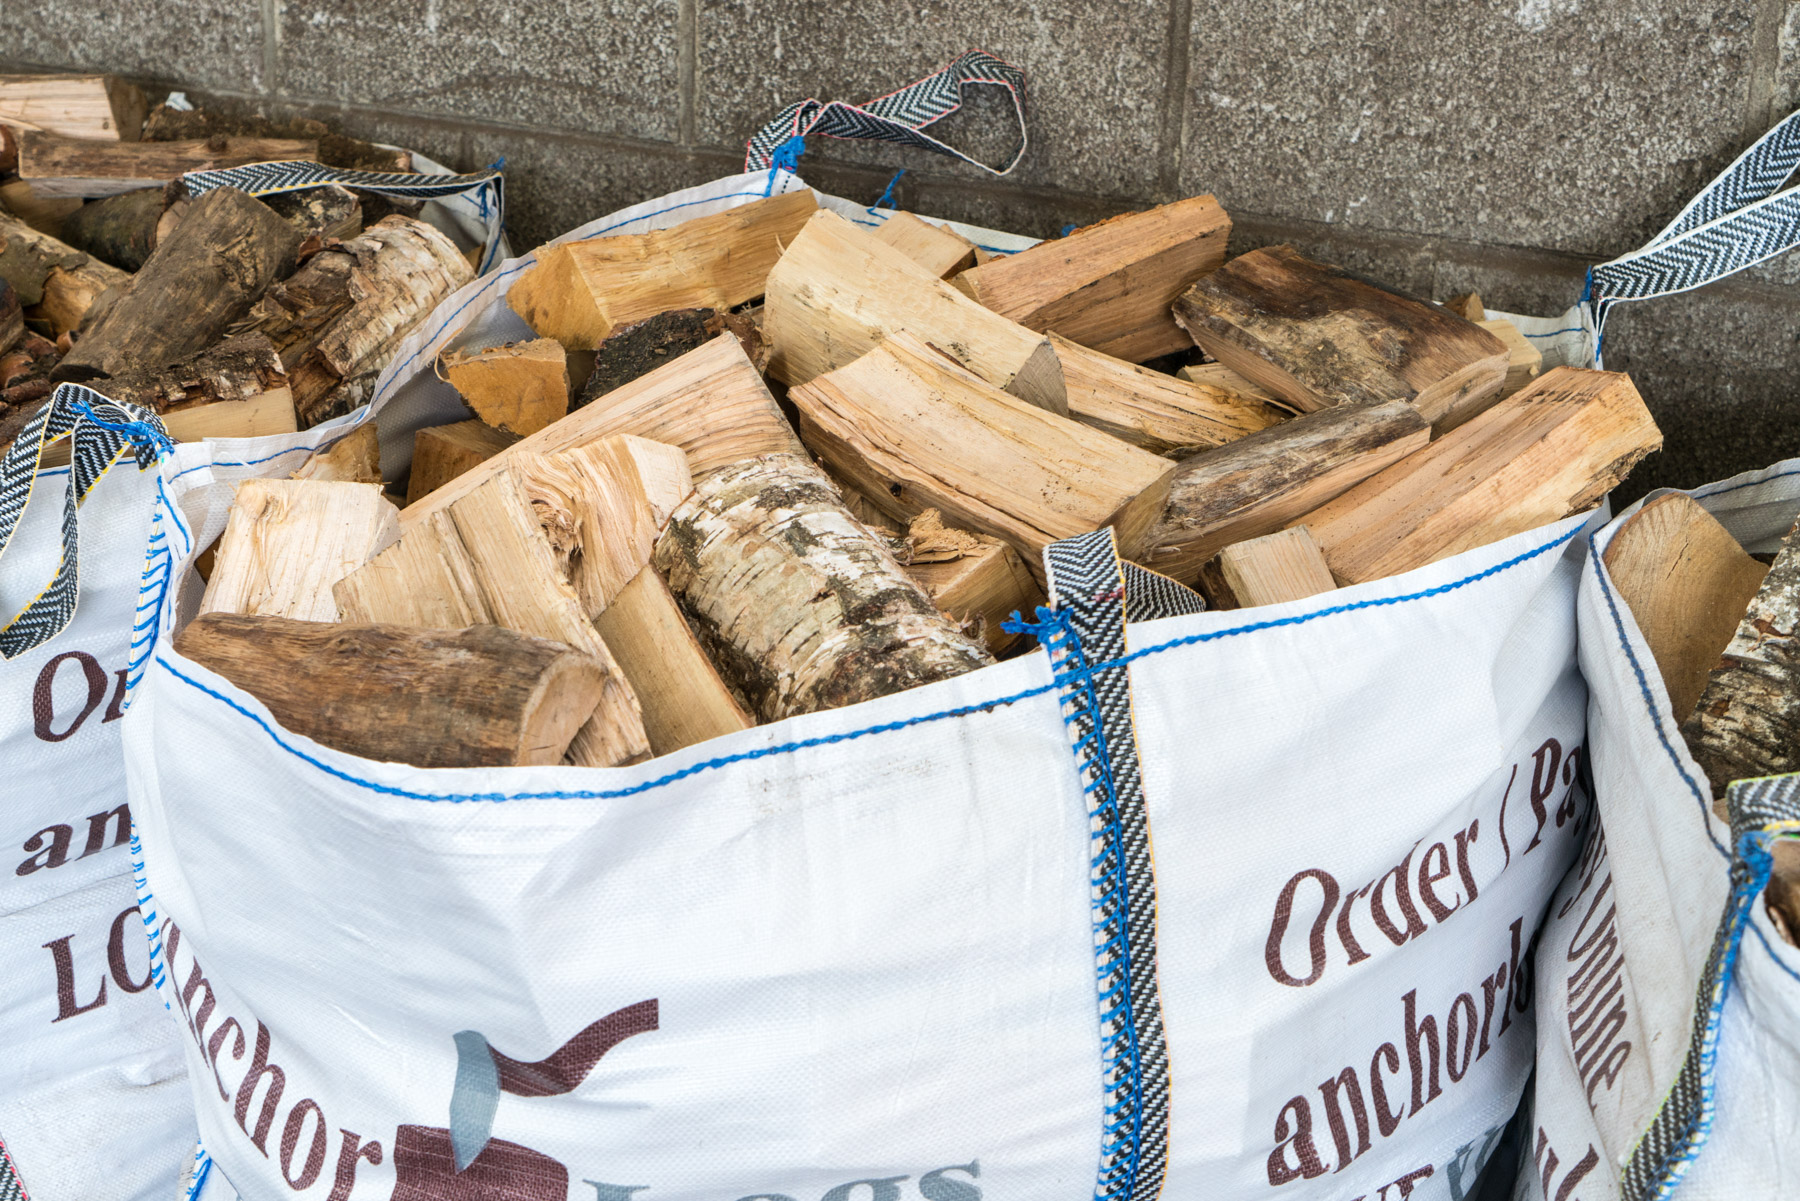 Large Dumpy Bag: Kiln Dried Mixed Hardwoods